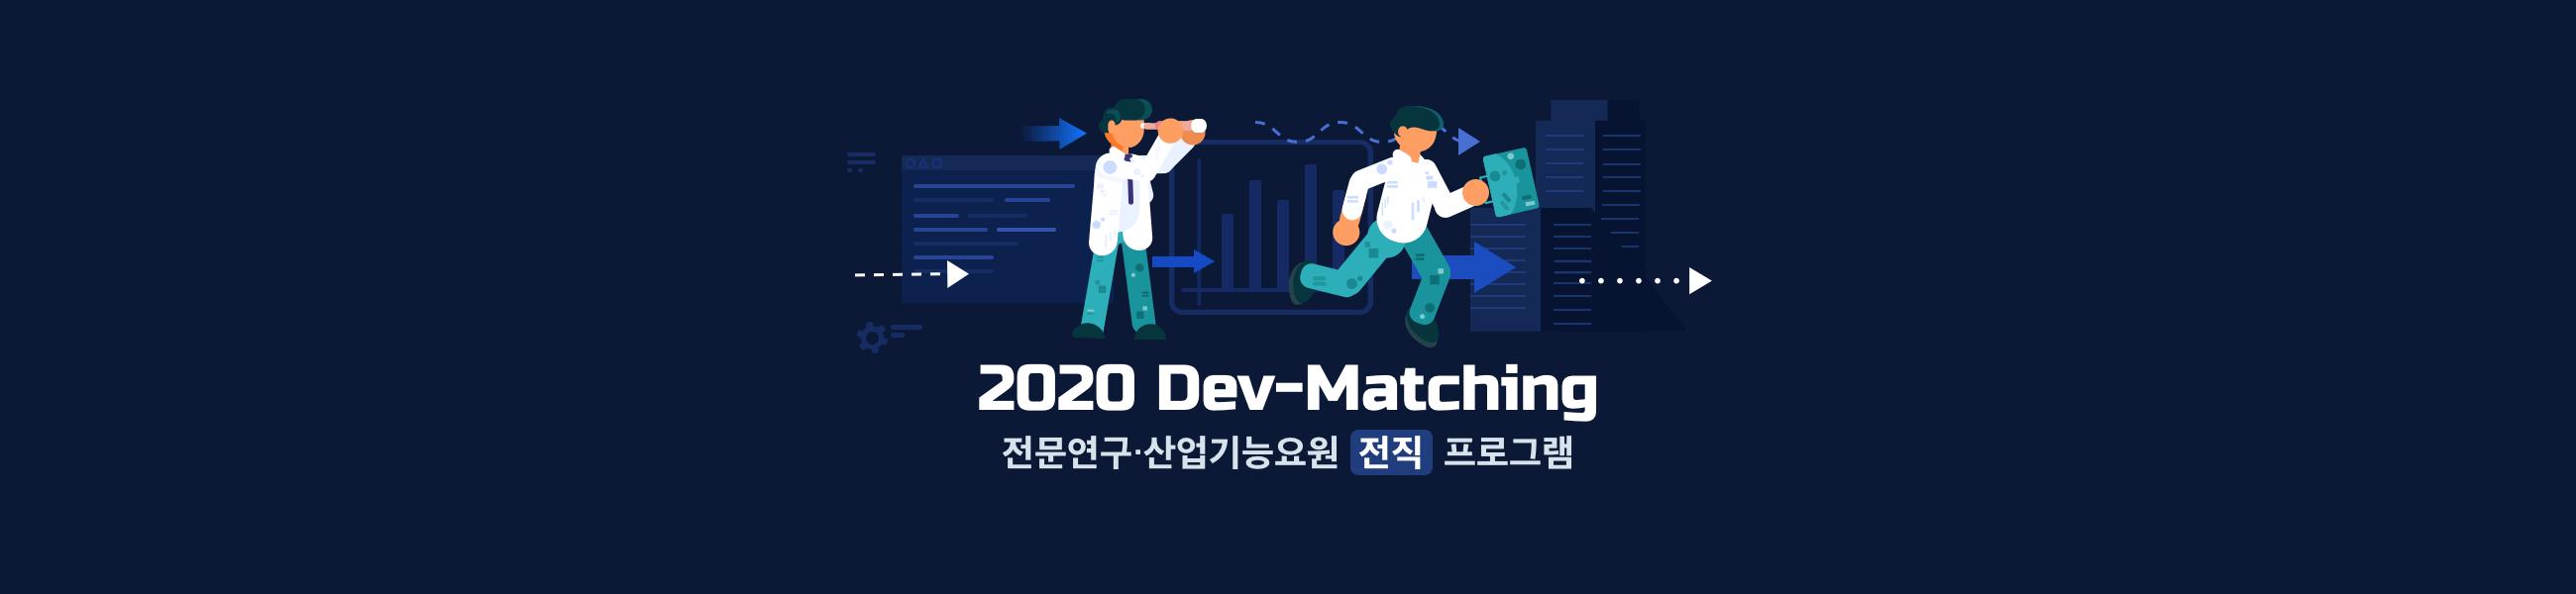 2020 Dev-Matching: 전문연구・산업기능요원 전직 프로그램의 이미지